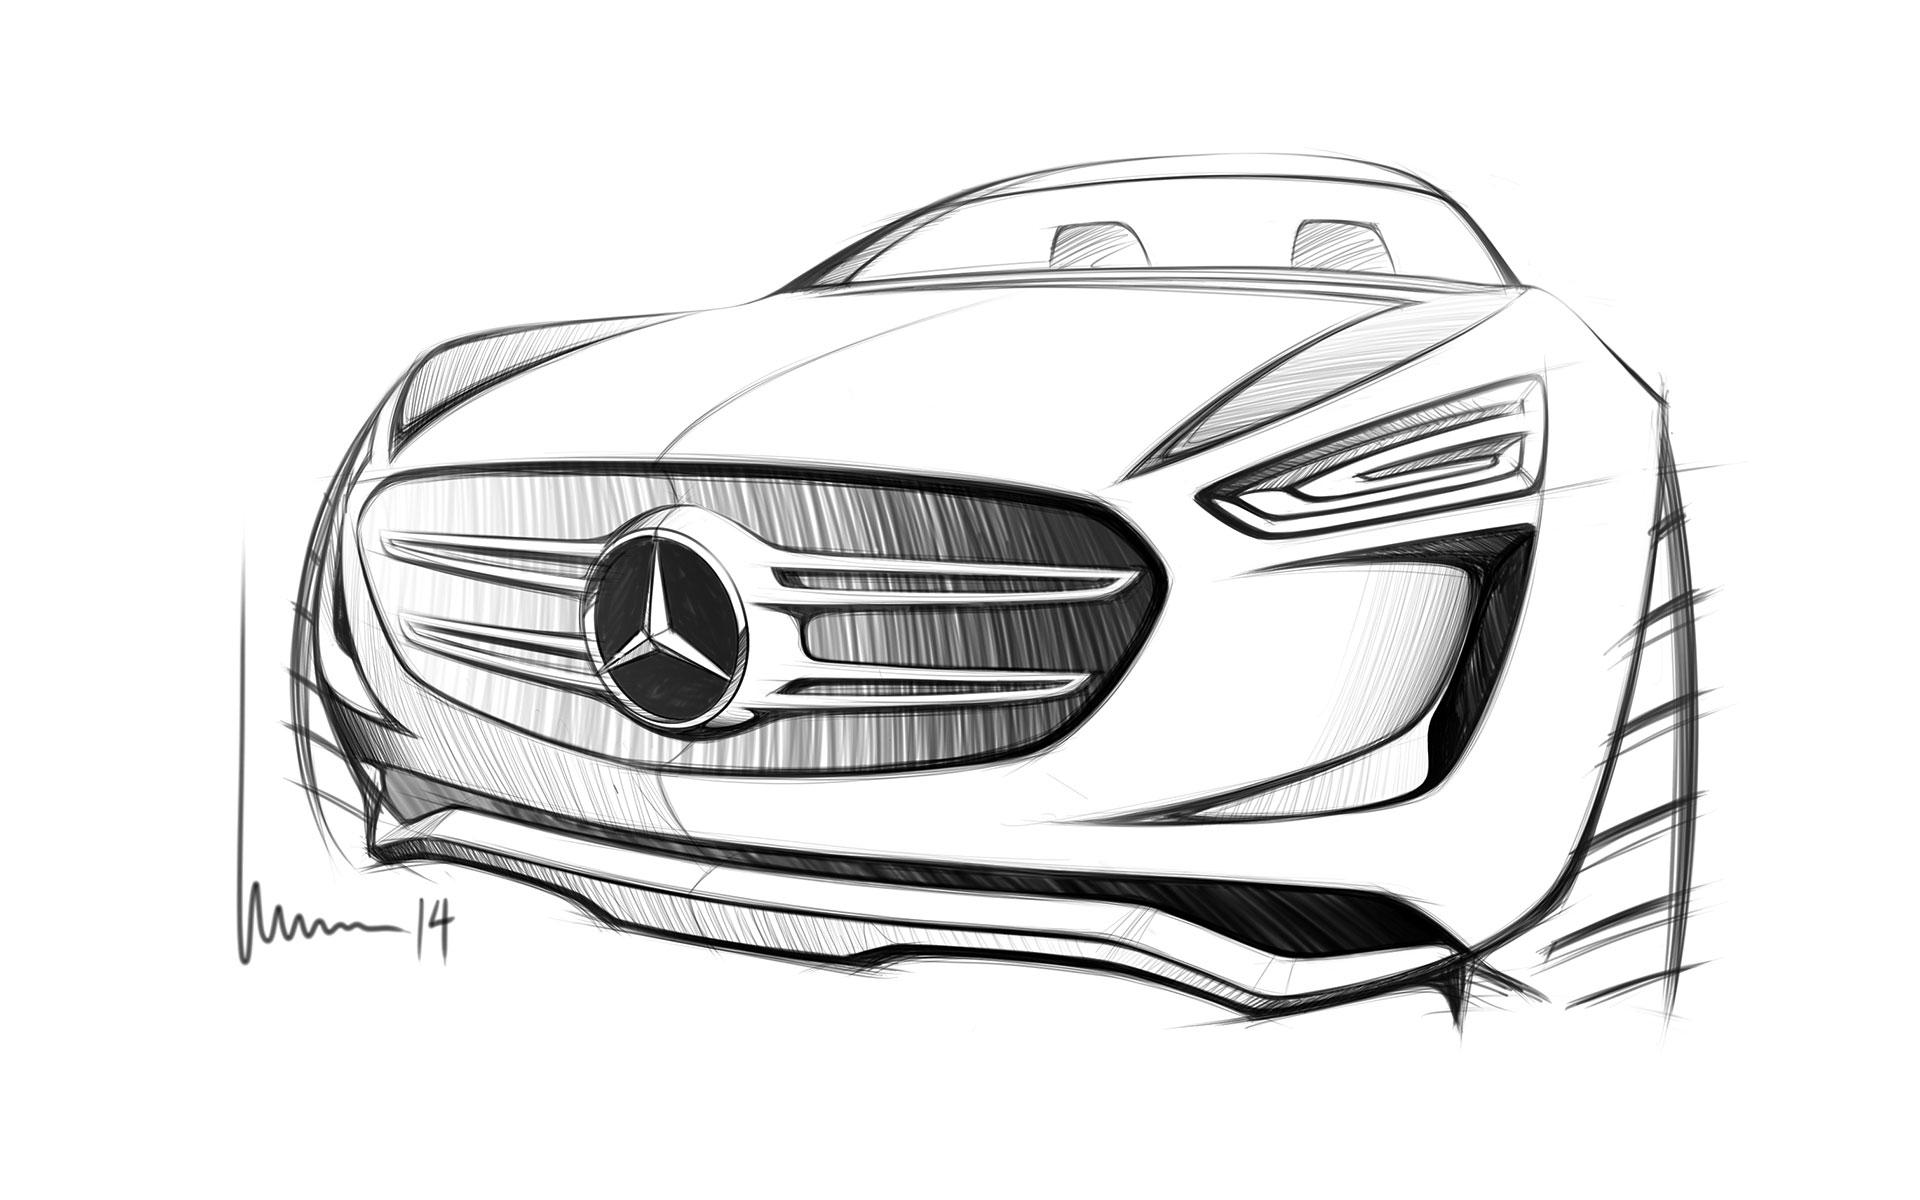 Mercedes Benz Vision G Code Concept